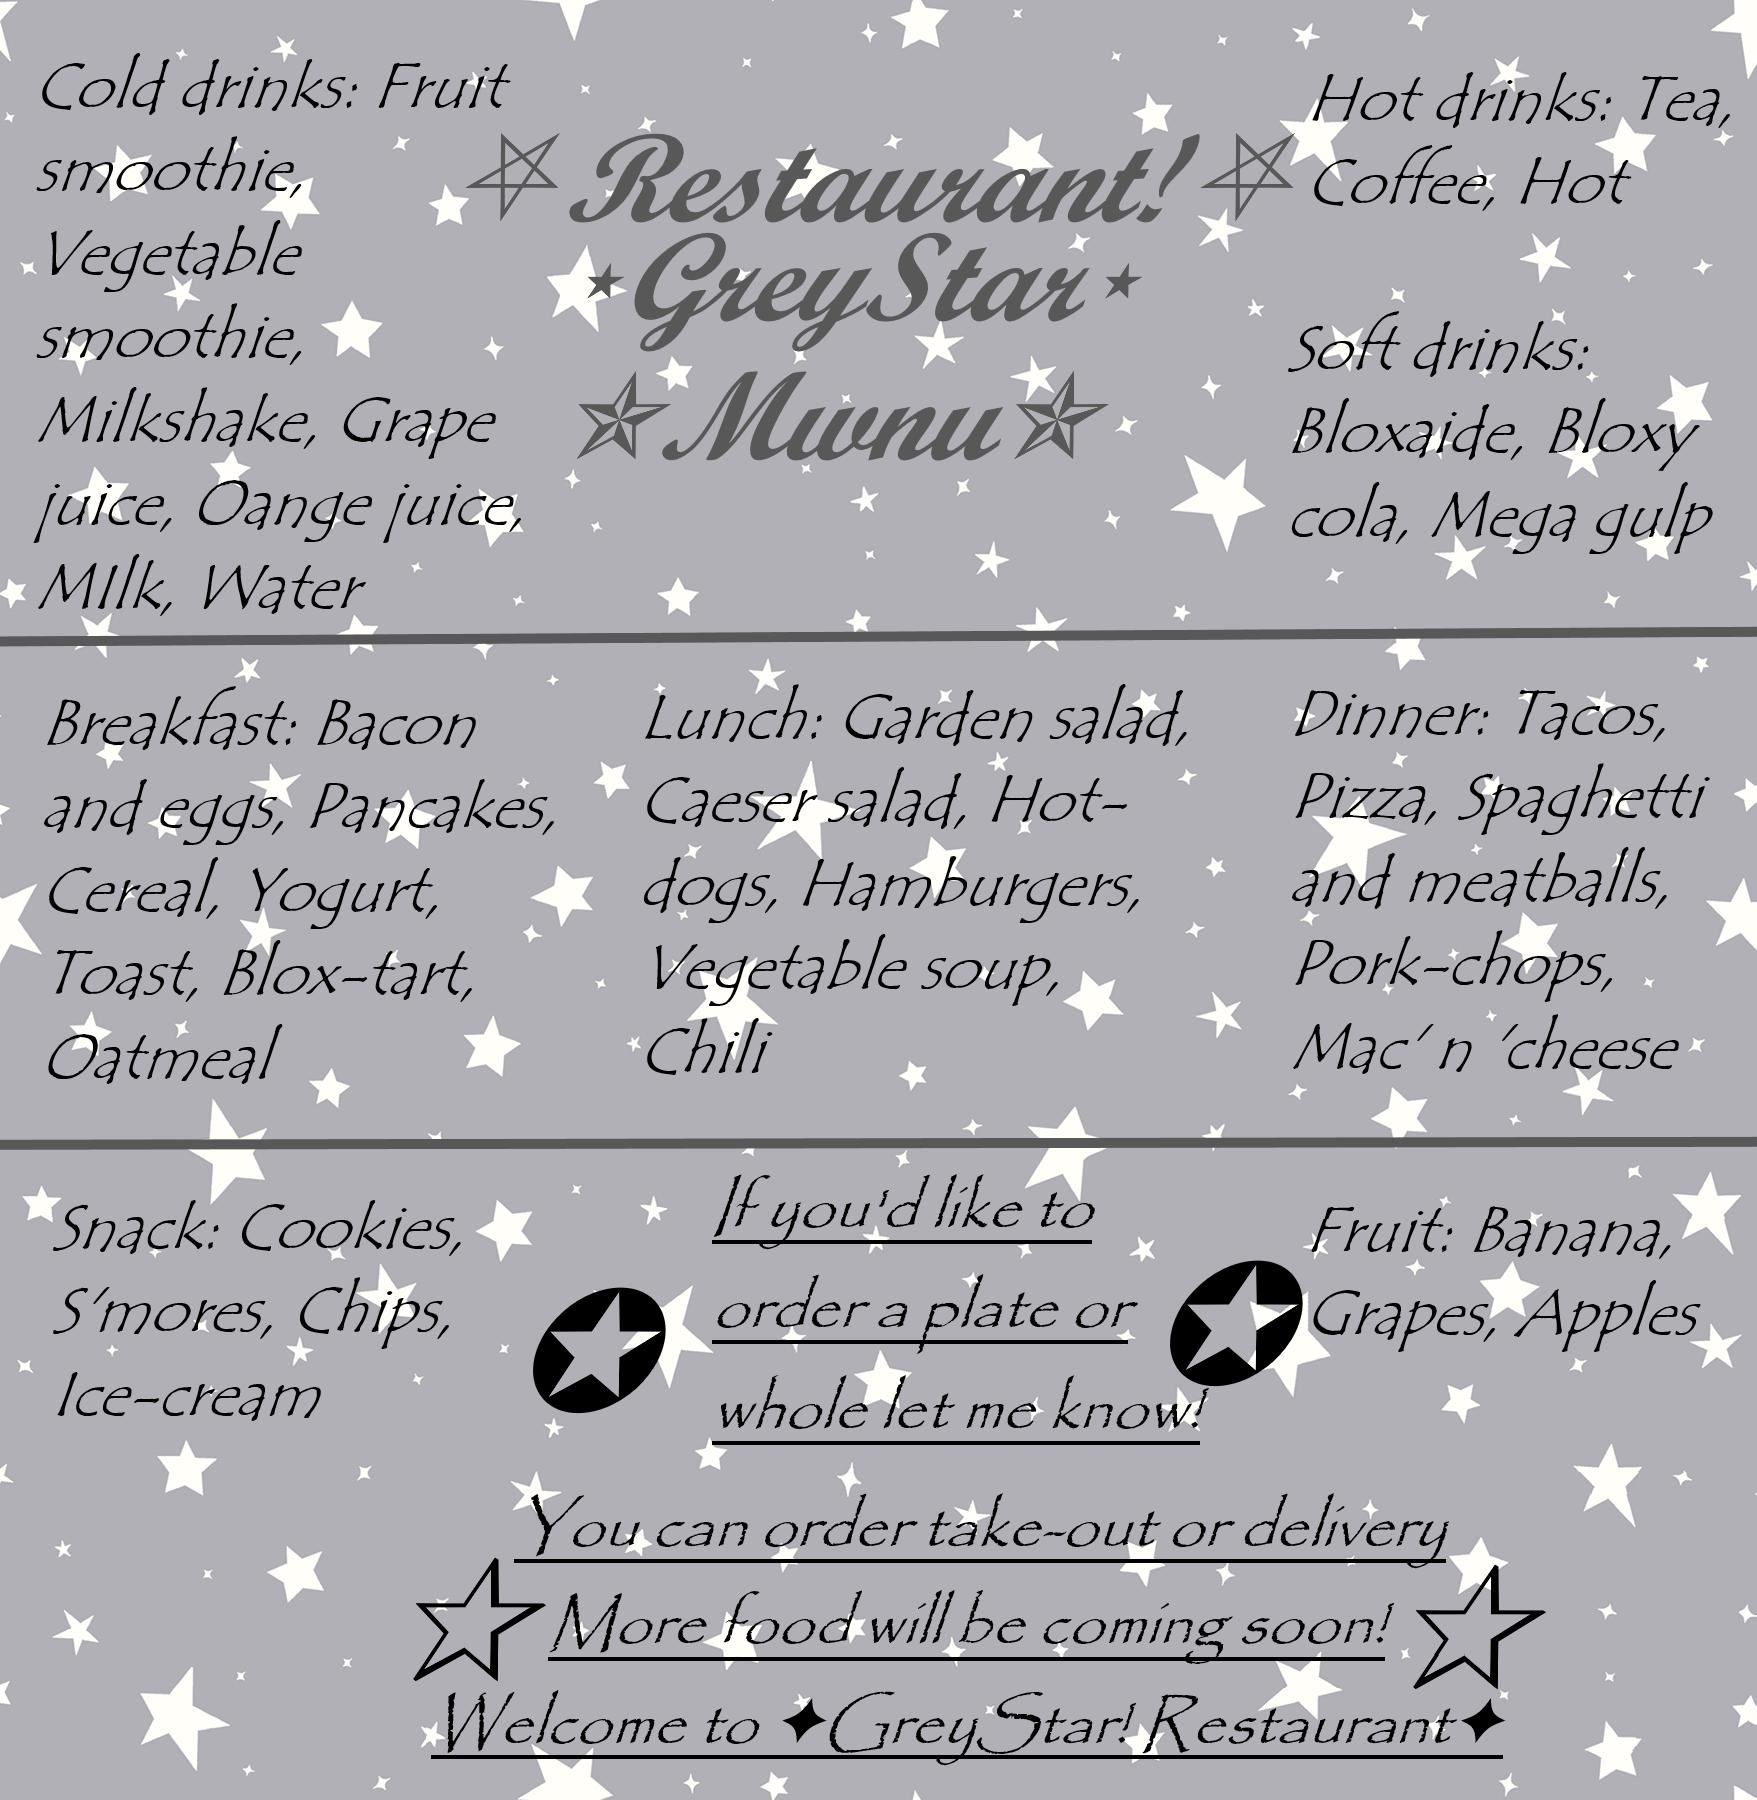 Roblox Codes For Bloxburg Kawaii Cafe This Is A Bloxburg S Menu D Cafe Sign Menu Restaurant Cafe Menu